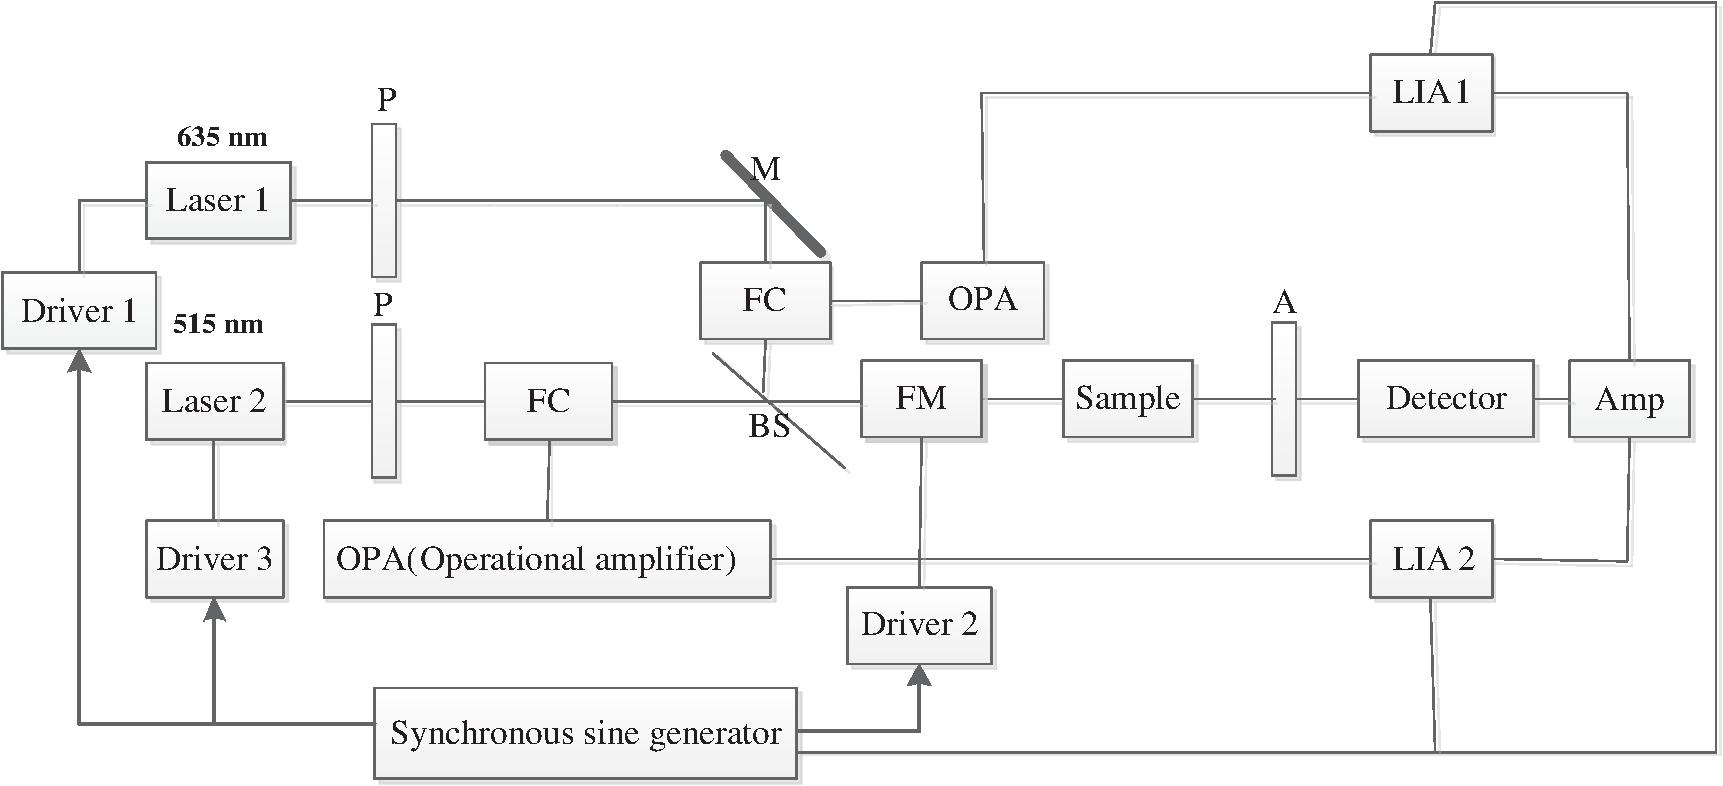 Dual Modulation Wavelength Optical Polarimetry System For Integrated Circuit Ne5532 Opamp Ce Distribution Block Diagram Of